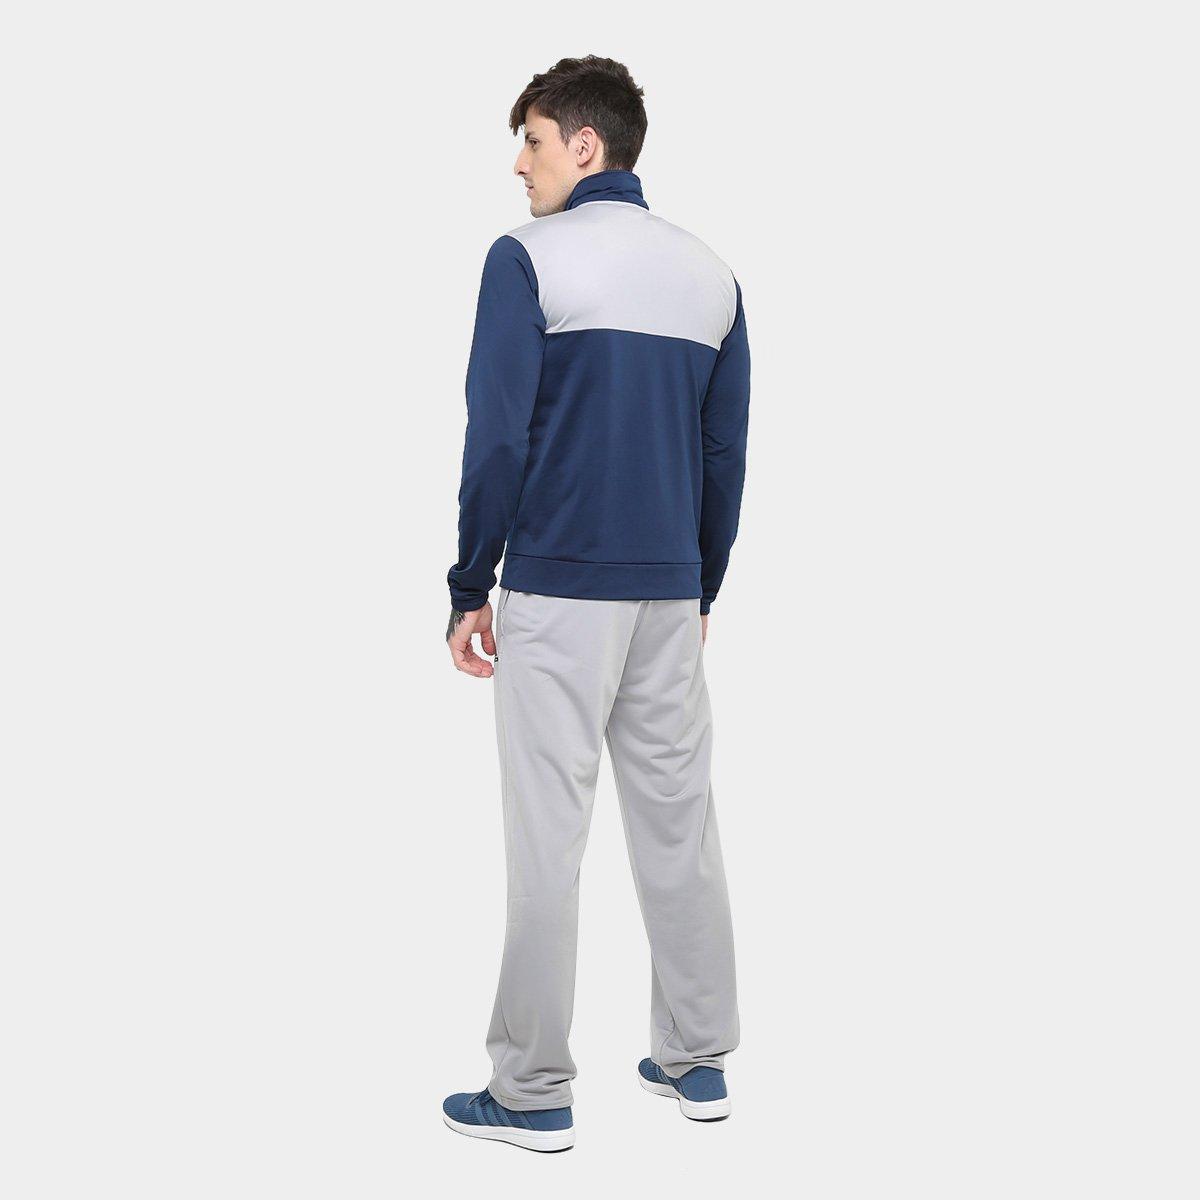 Agasalho Adidas Back 2 Basics Masculino - Marinho e Cinza - Compre ... 9bd62f0fcedcd